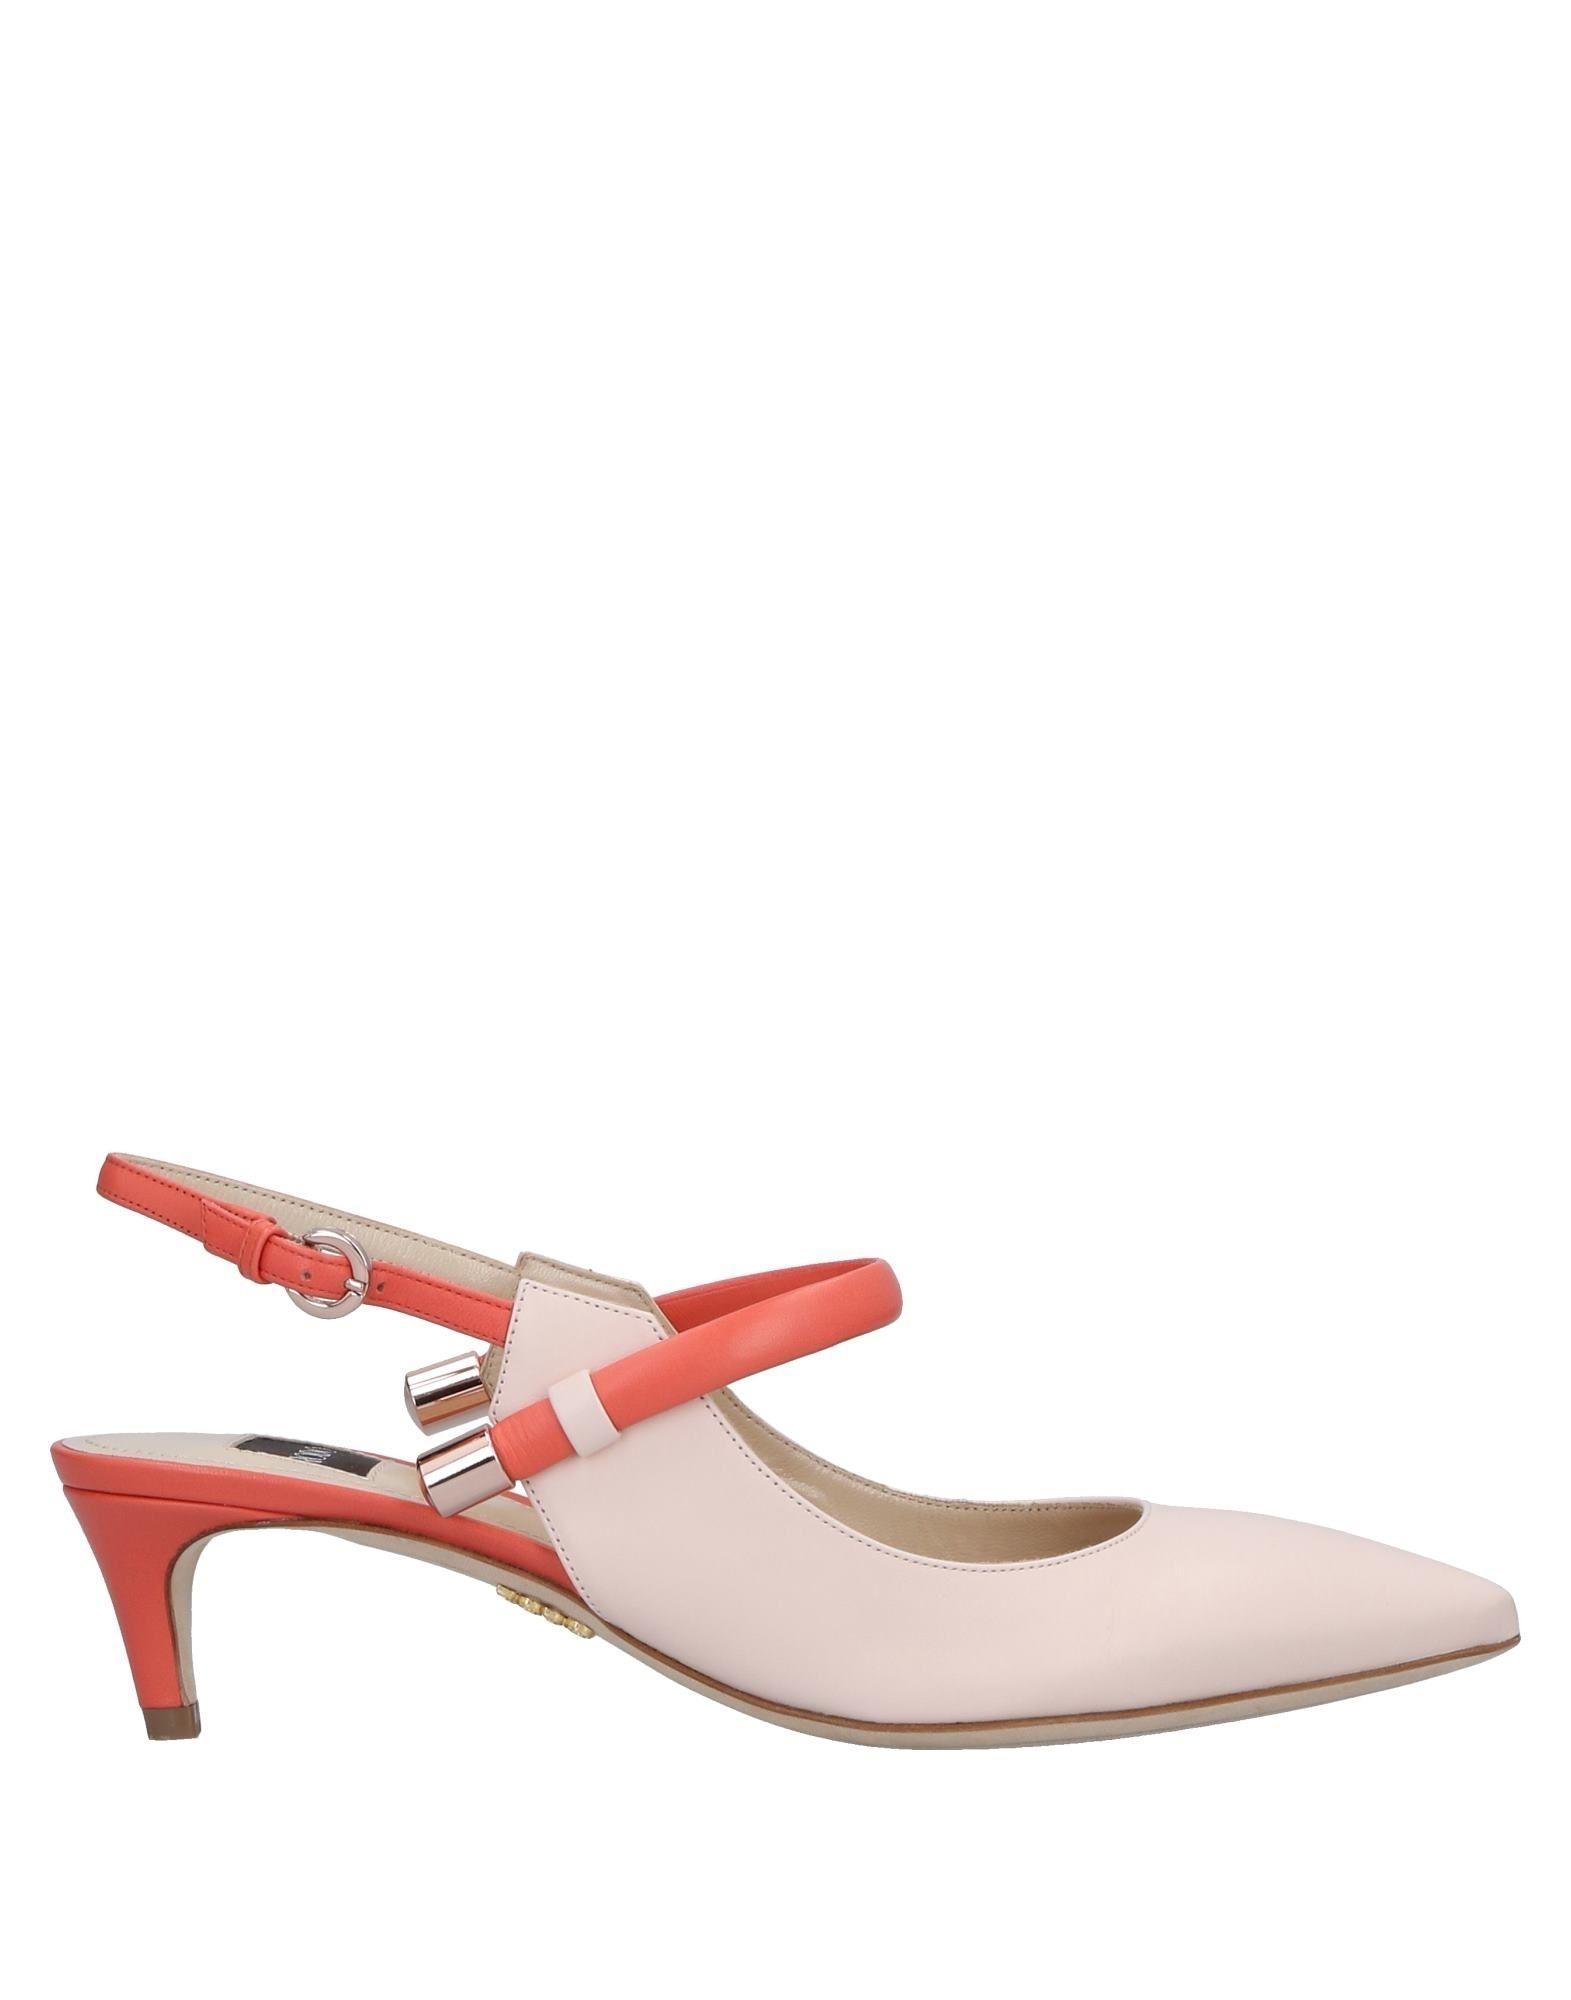 Rodo Pumps Damen  11351804MKGut aussehende strapazierfähige Schuhe